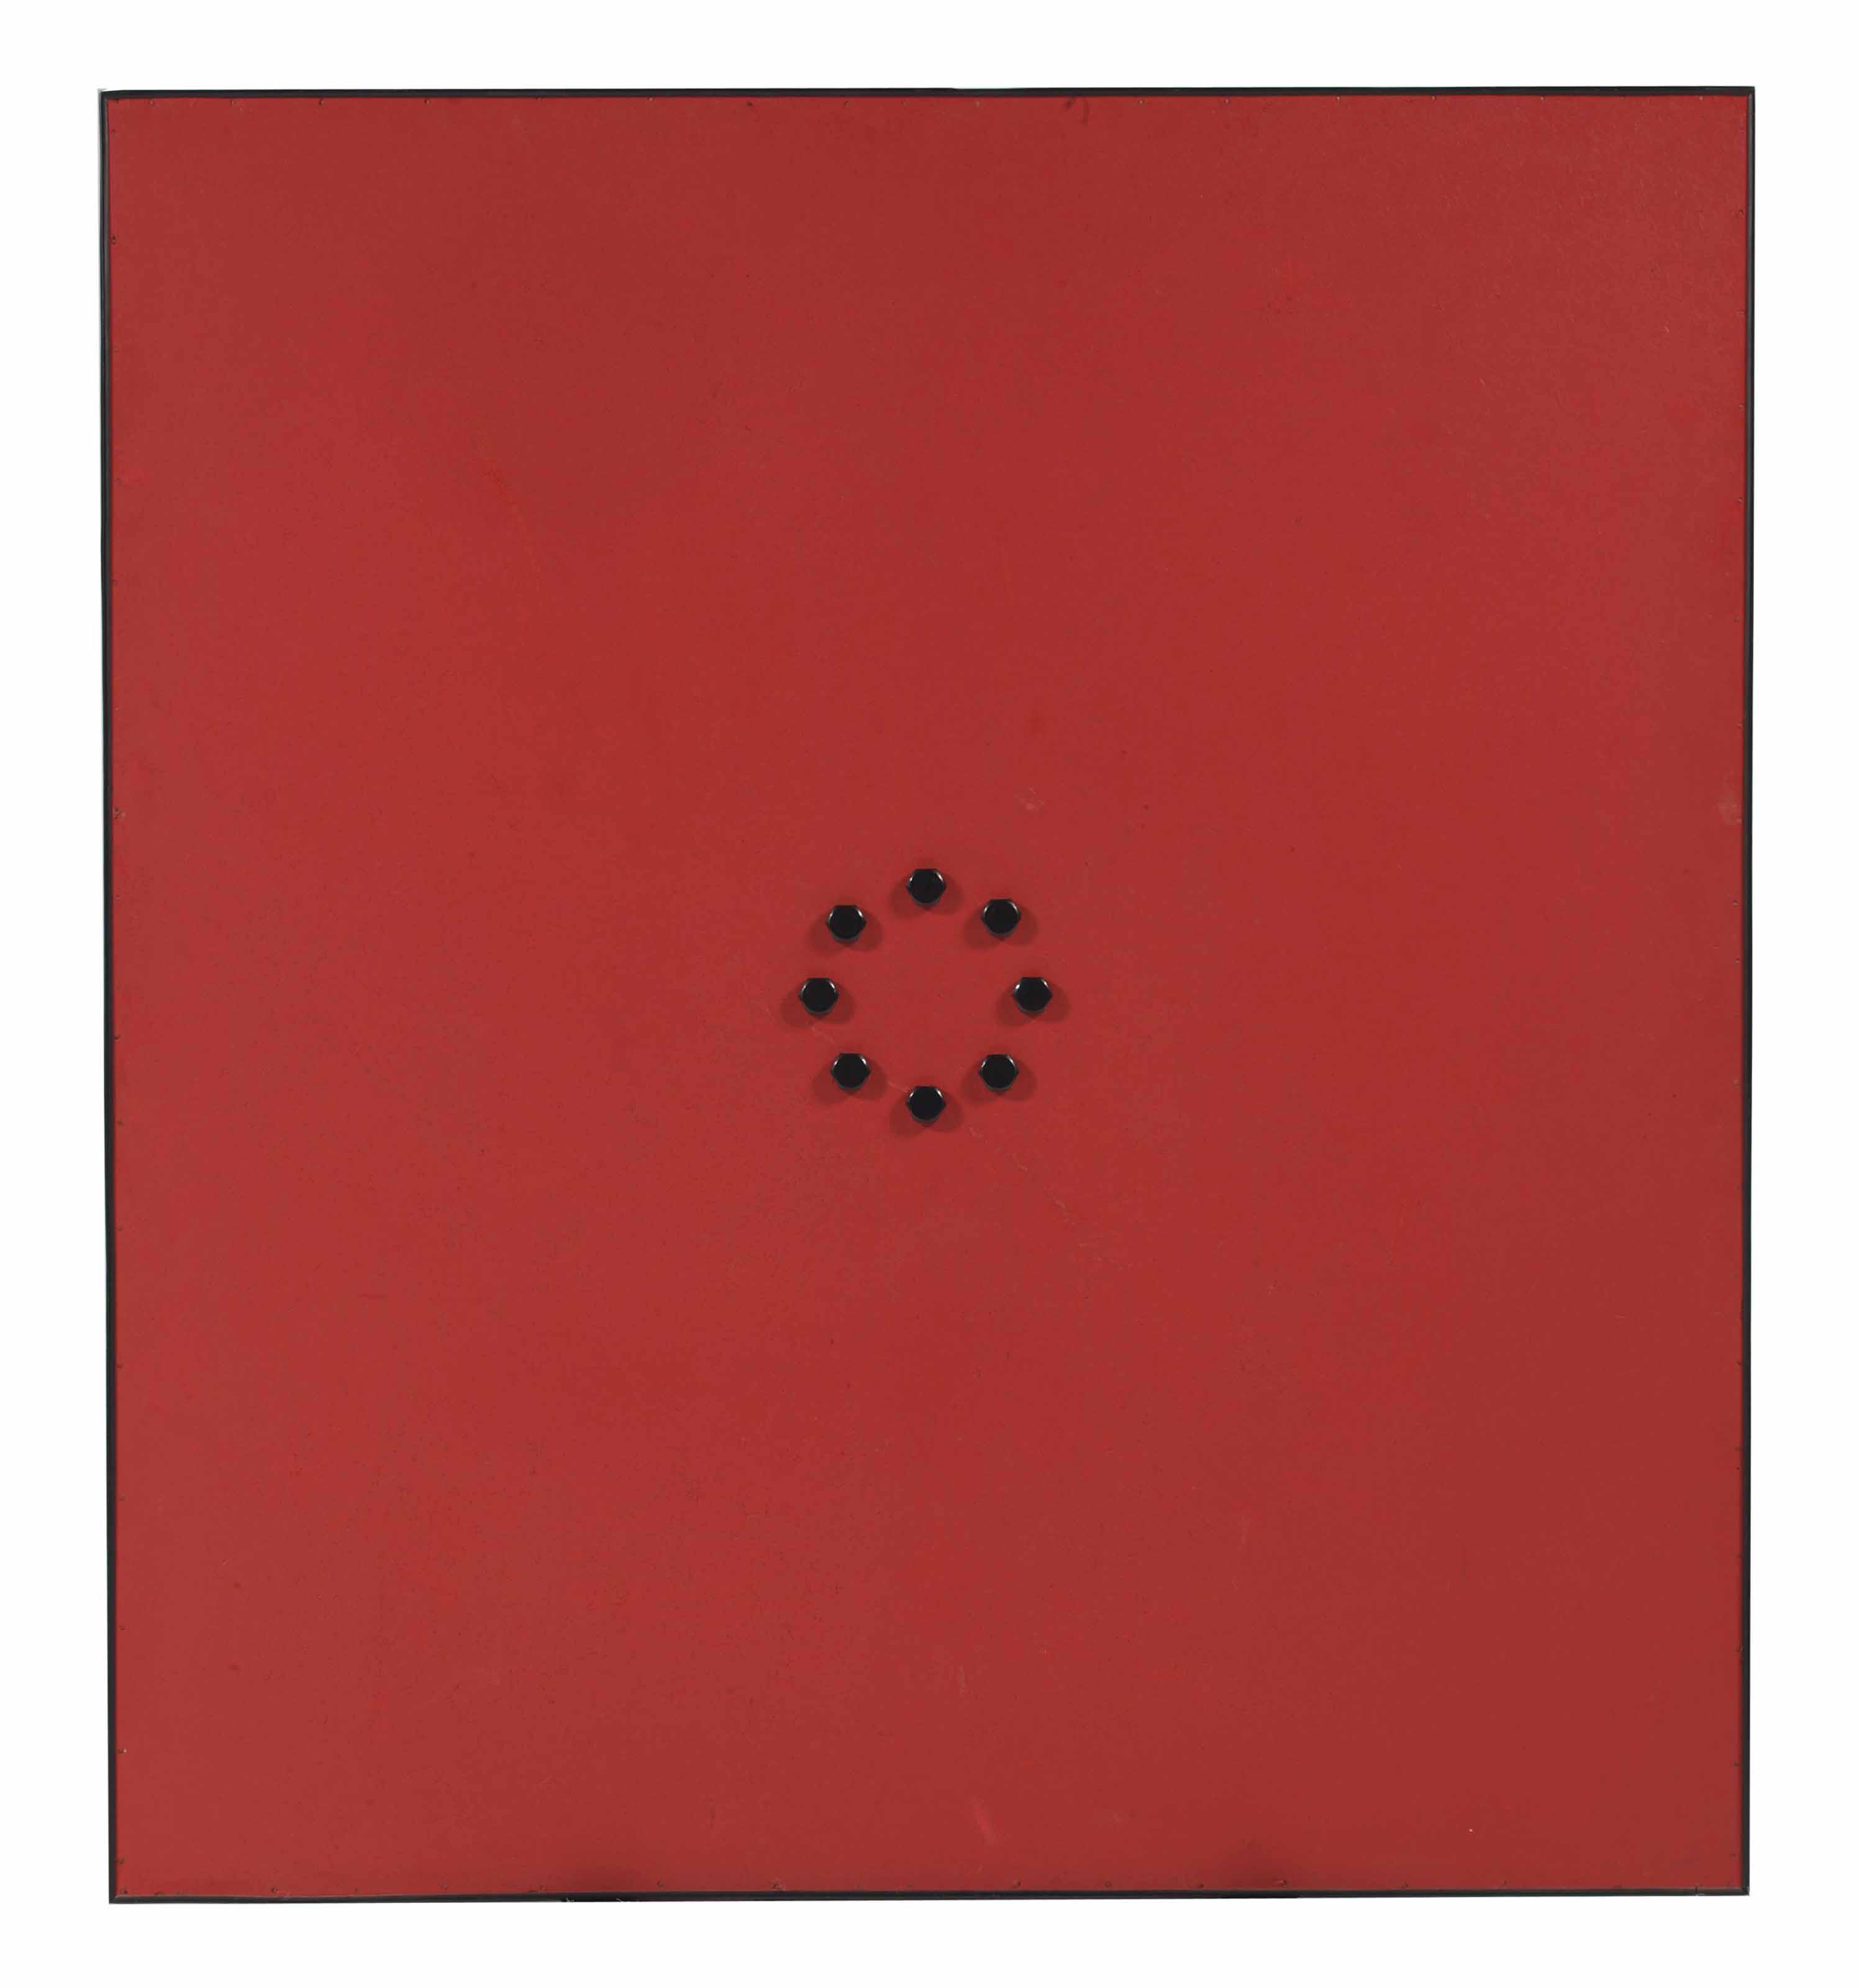 Cirkel 8 (8 black bolts on red)